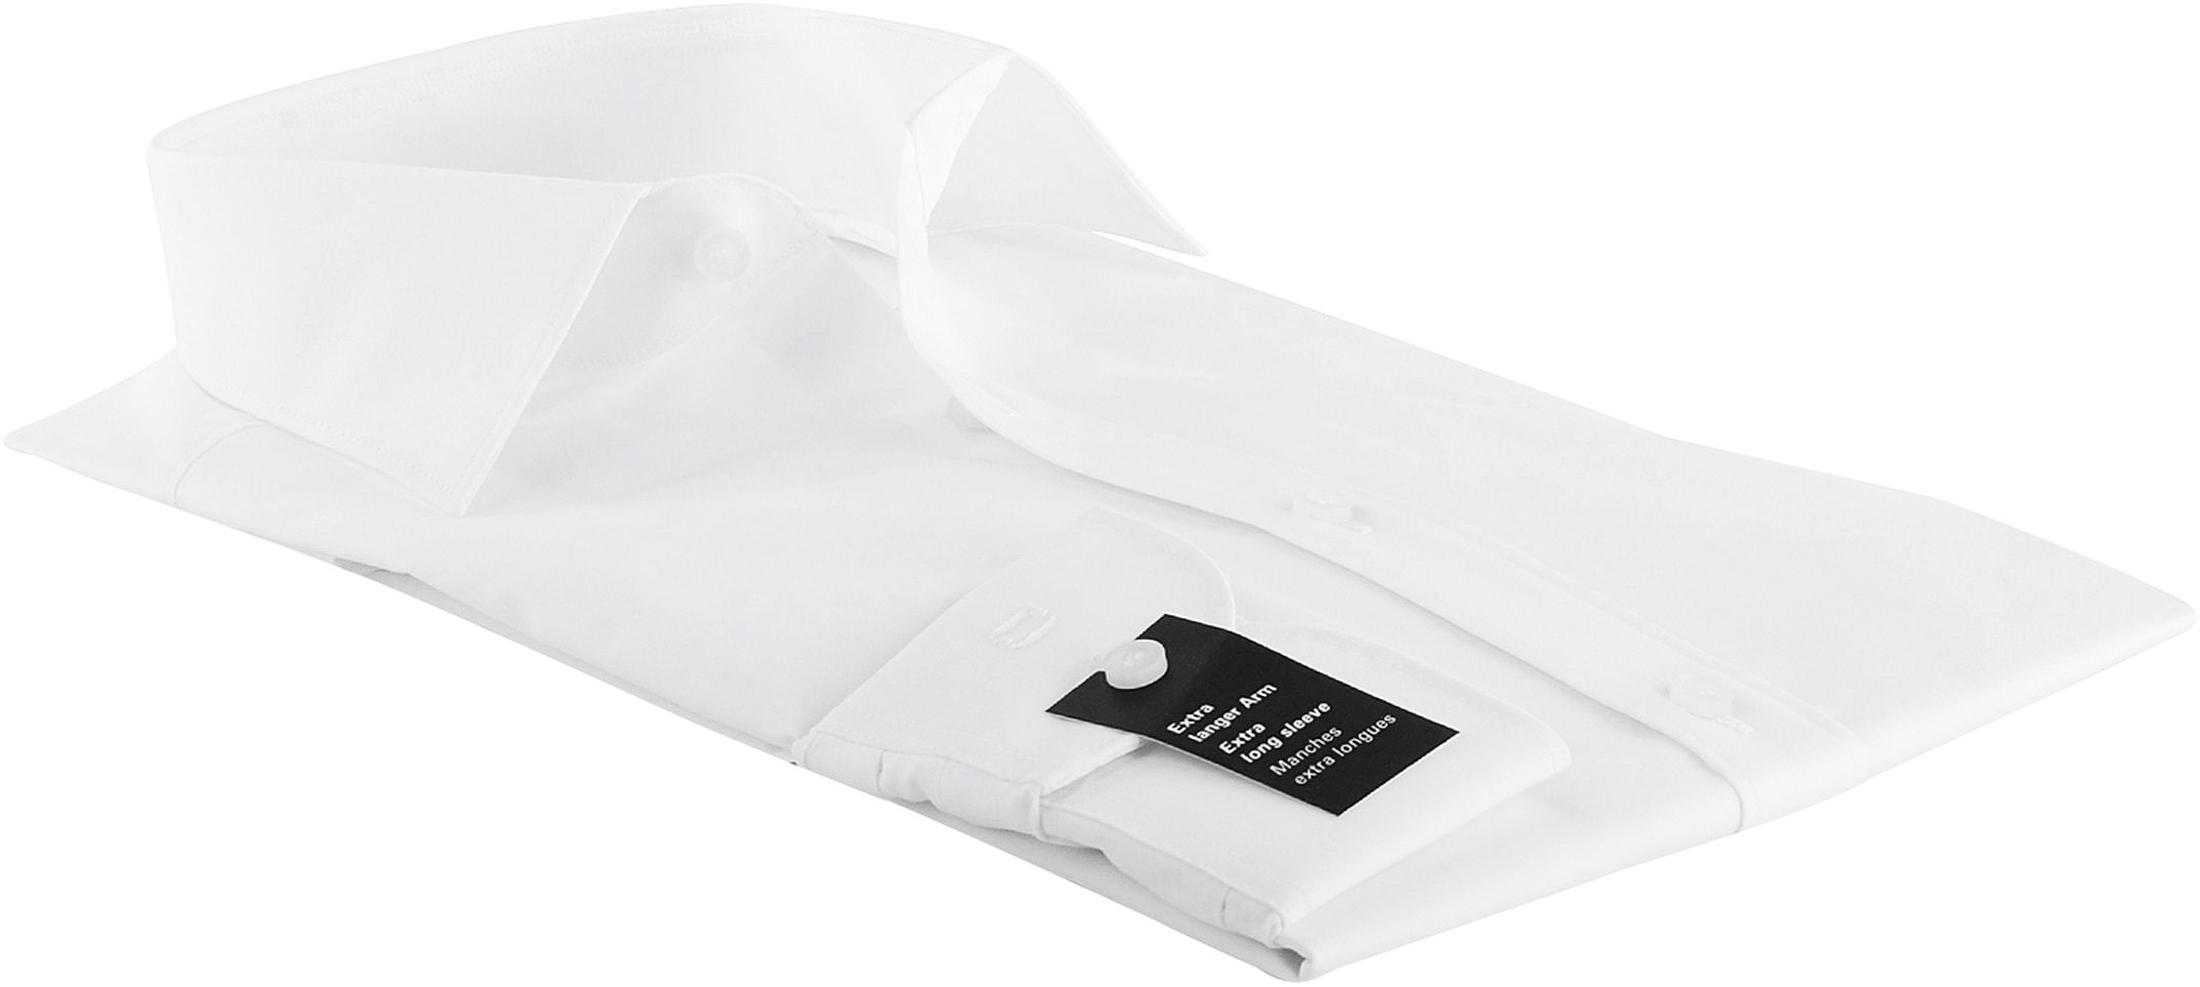 OLYMP Level Five Hemd SL7 Weiß Body Fit